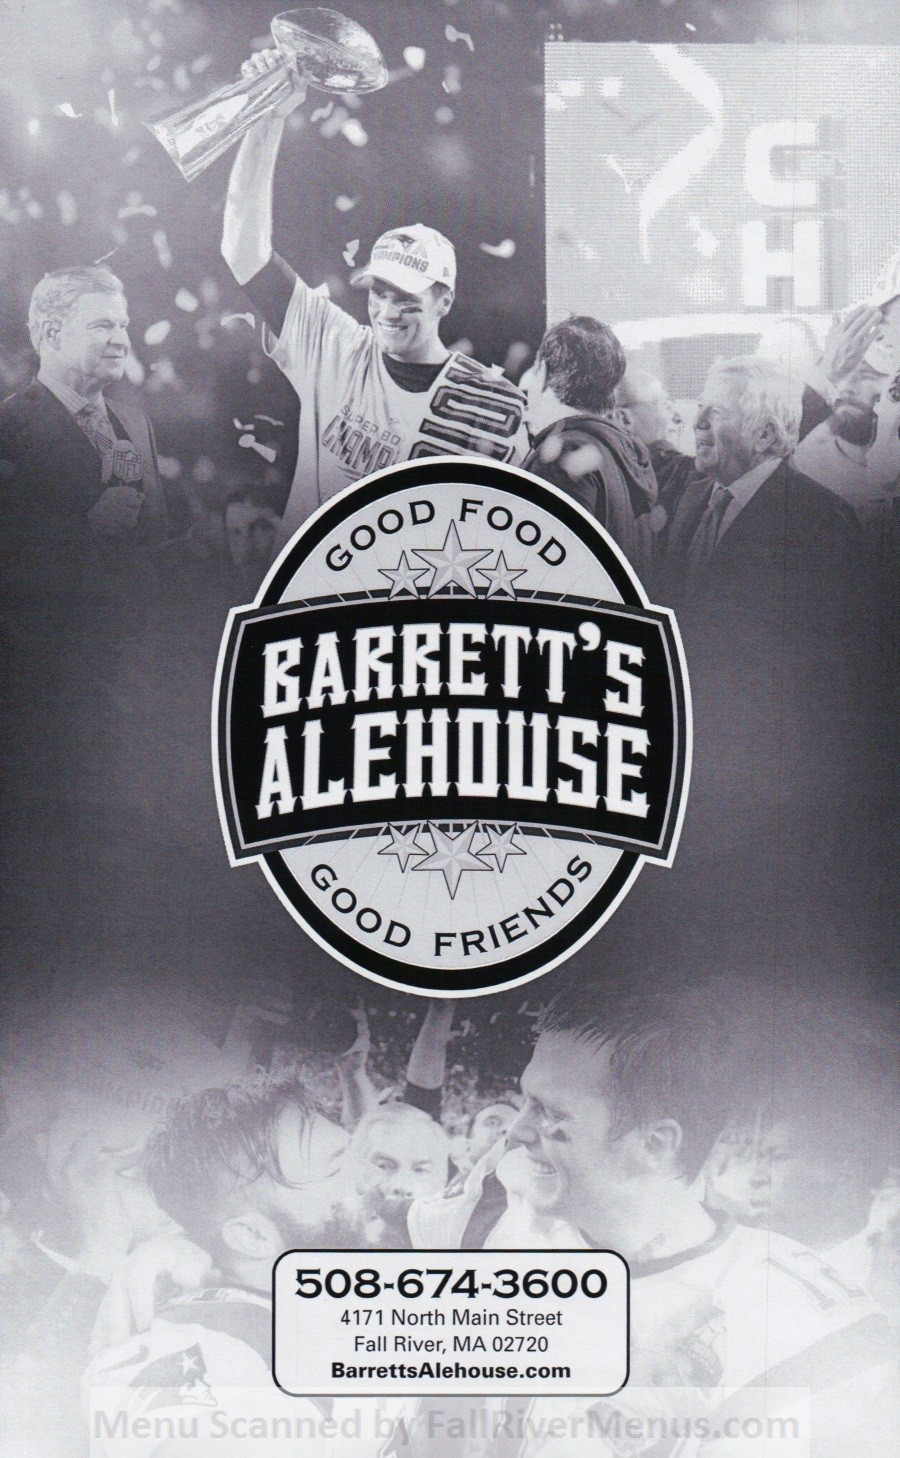 Rogers Hot Dogs Fall River  Barrett's Alehouse